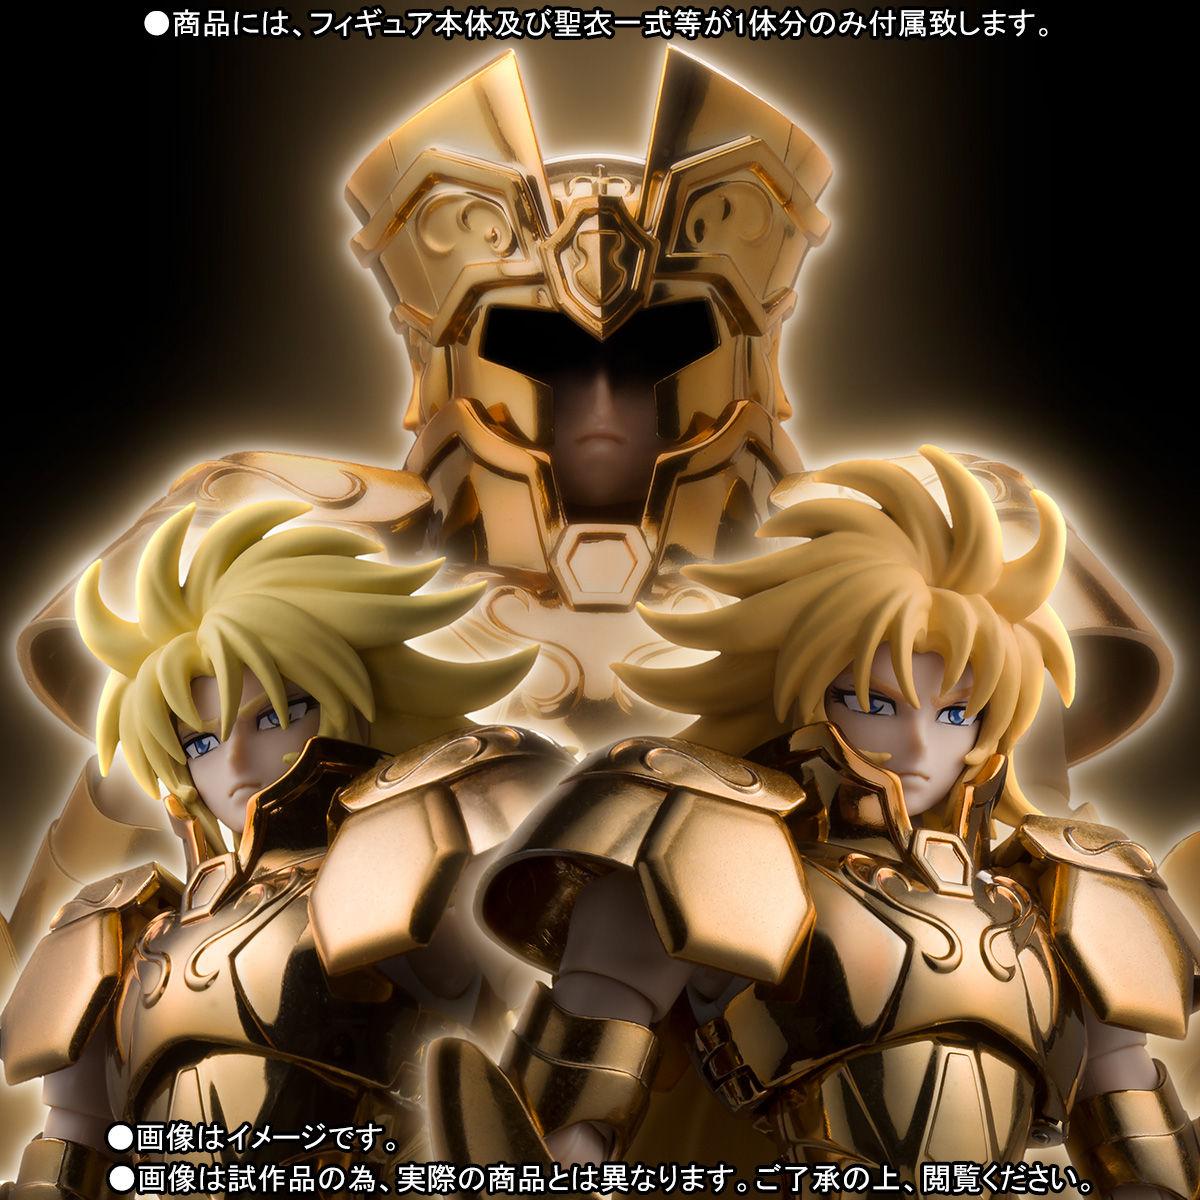 ROBOT魂 〈SIDE MS〉『RX-78-2 ガンダム & Gファイター ver. A.N.I.M.E.~リアルタイプカラー~』可動フィギュア-014